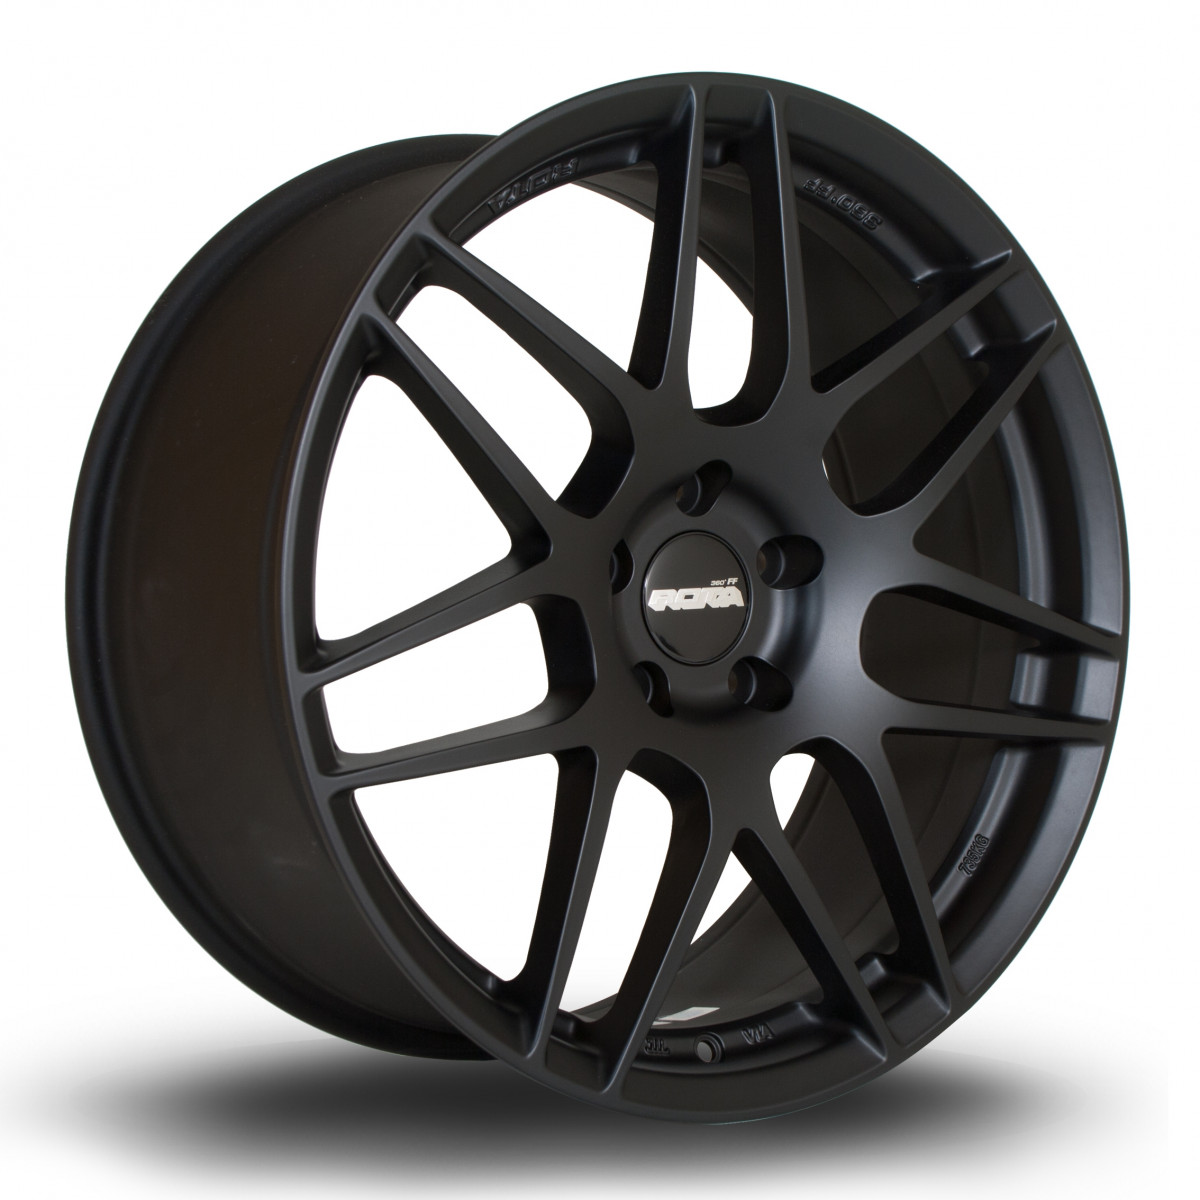 FF01 19x8.5 5x112 ET45 Flat Black